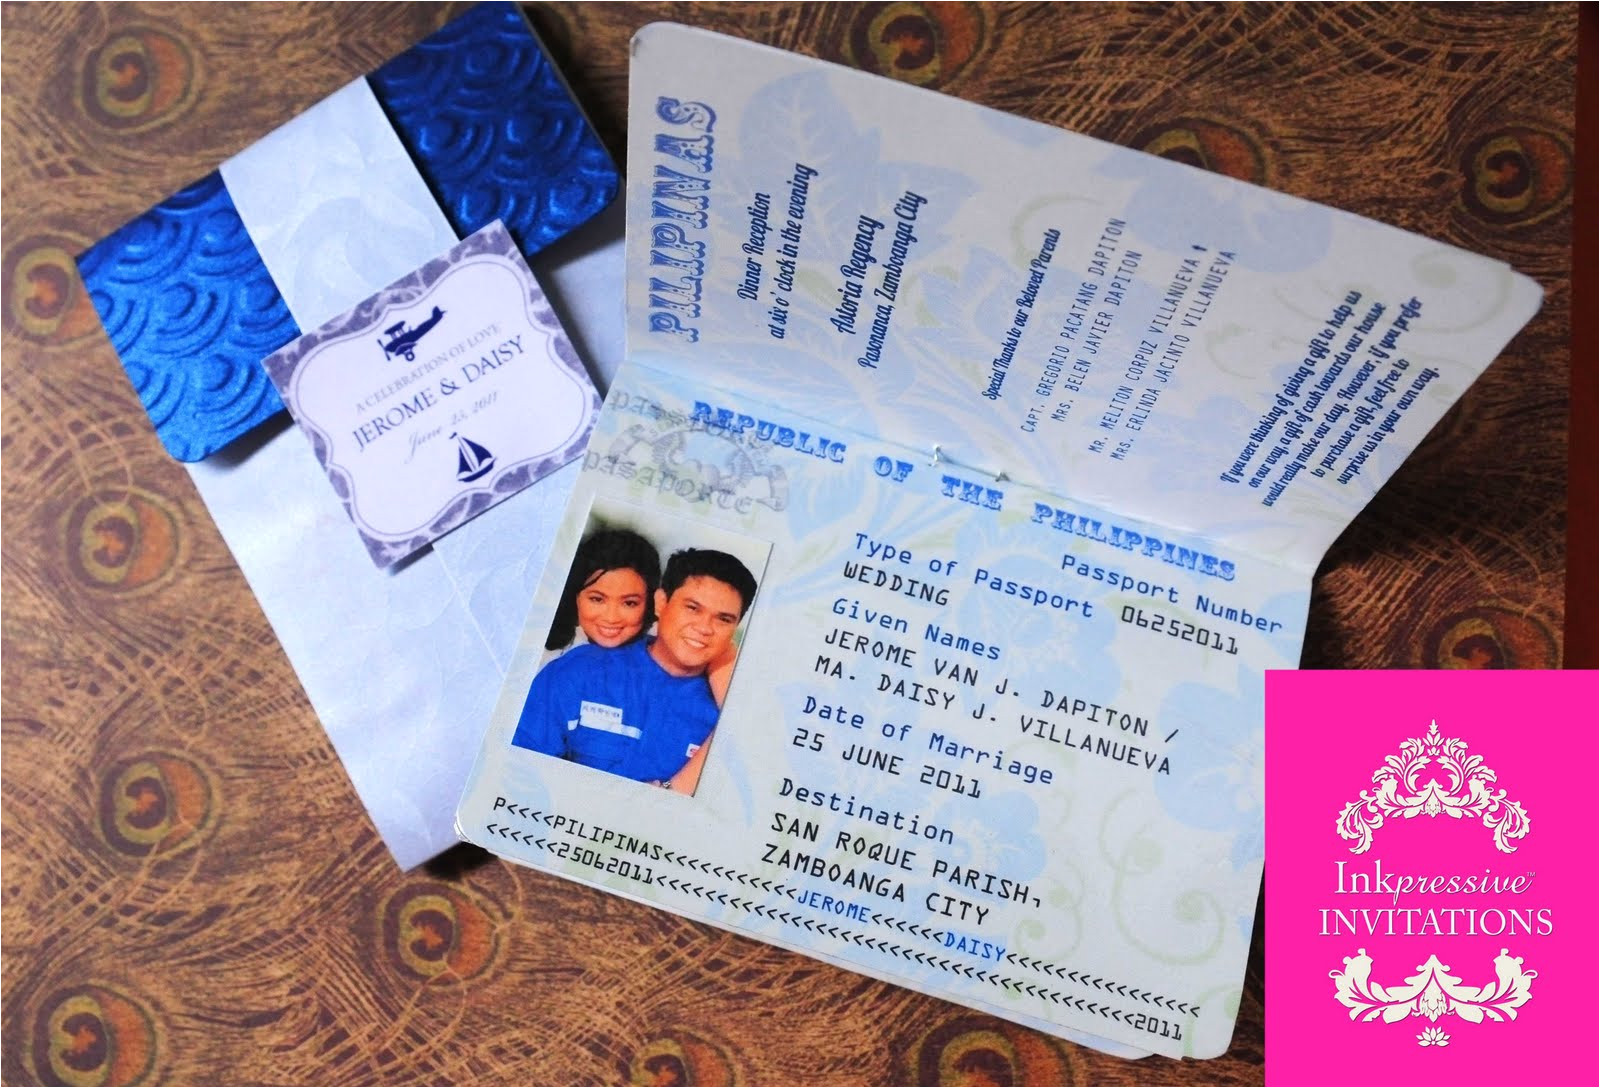 passport daisy jerome 06272011